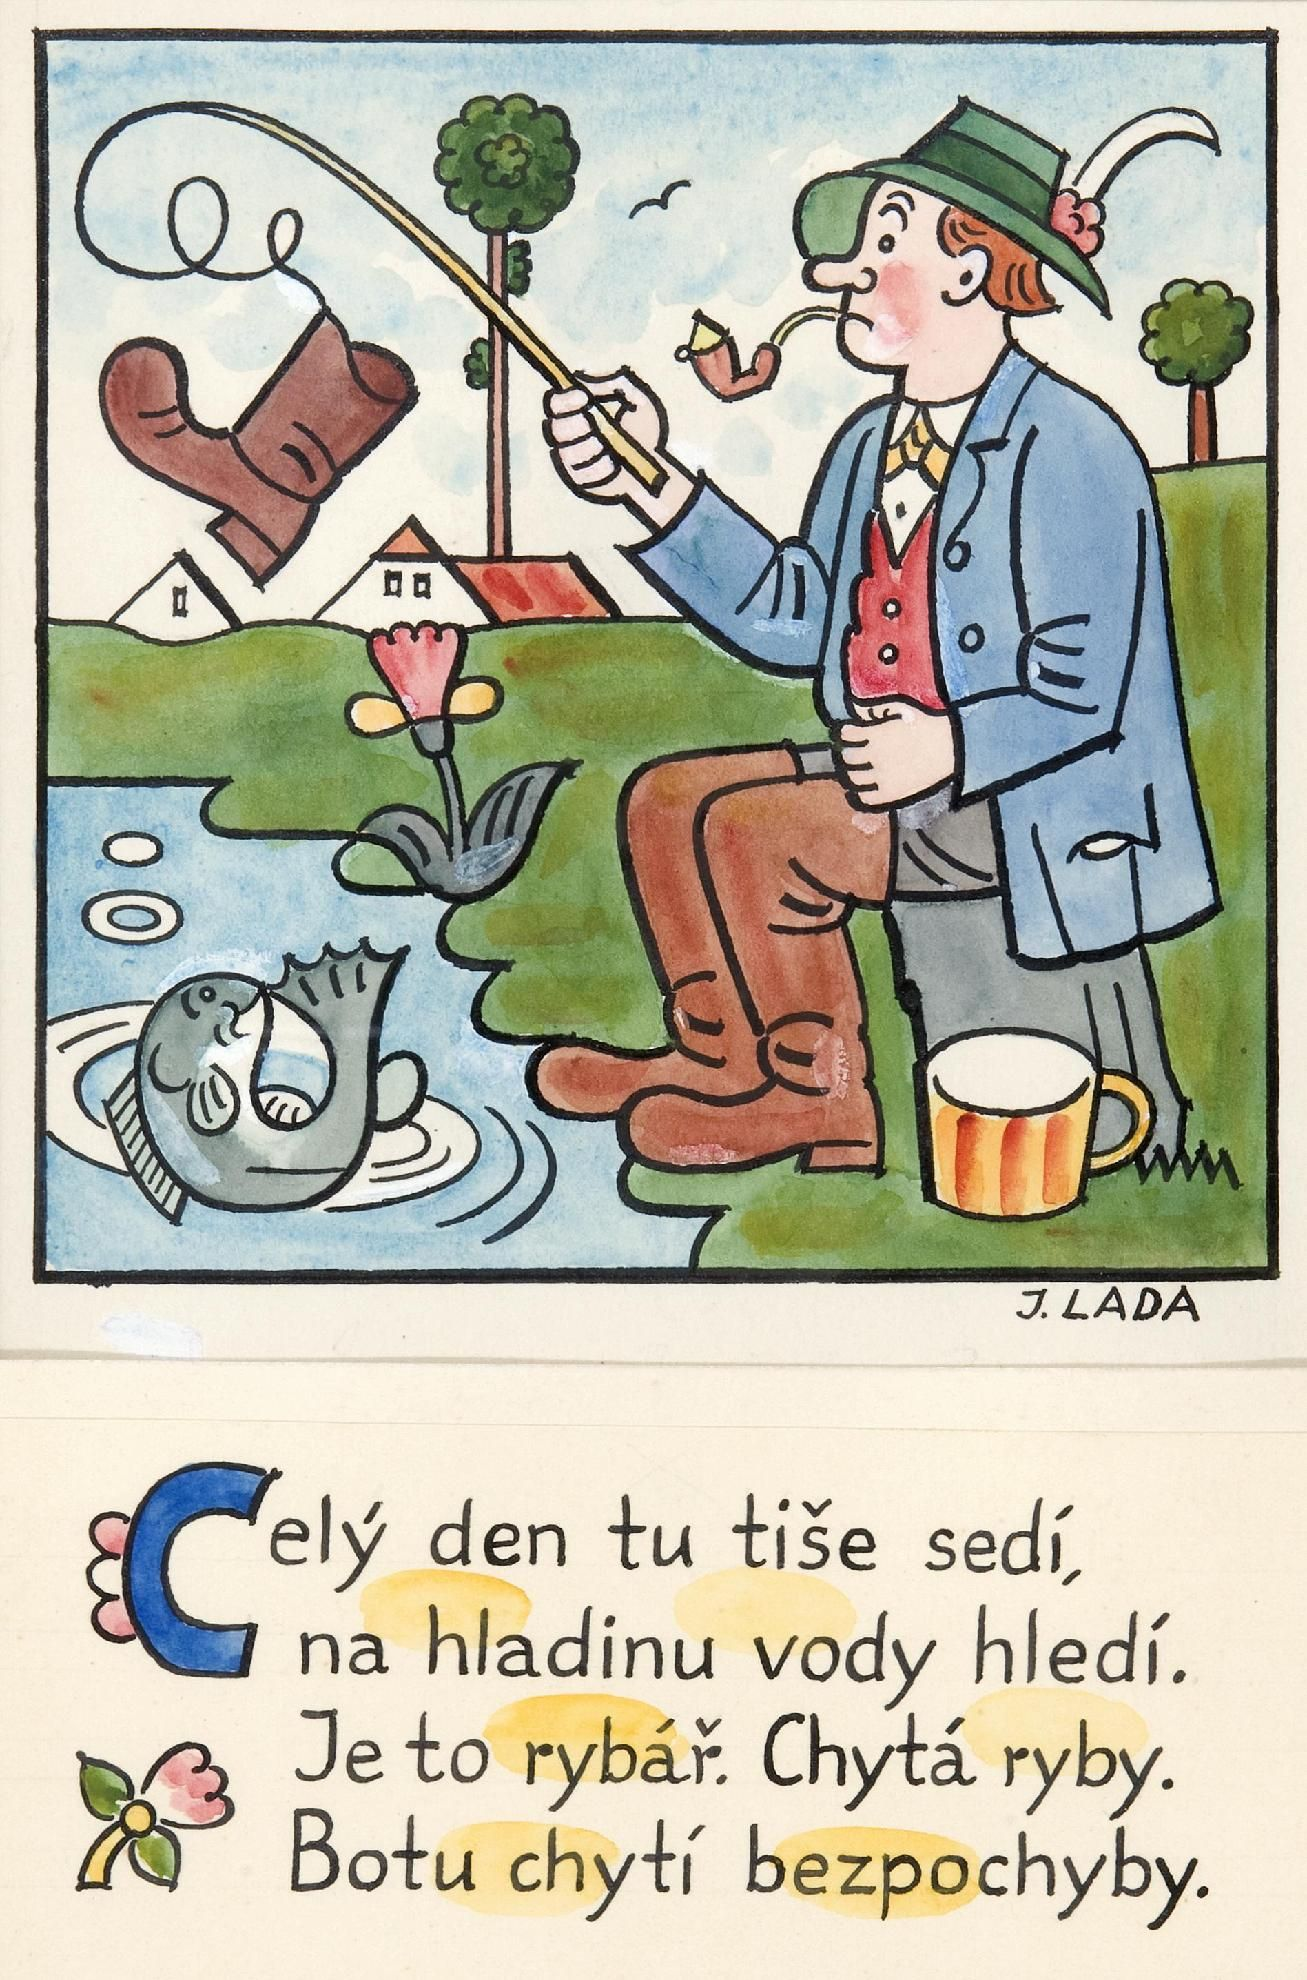 Kalamajka - Celý den tu tiše sedí ( Rybář), 1913